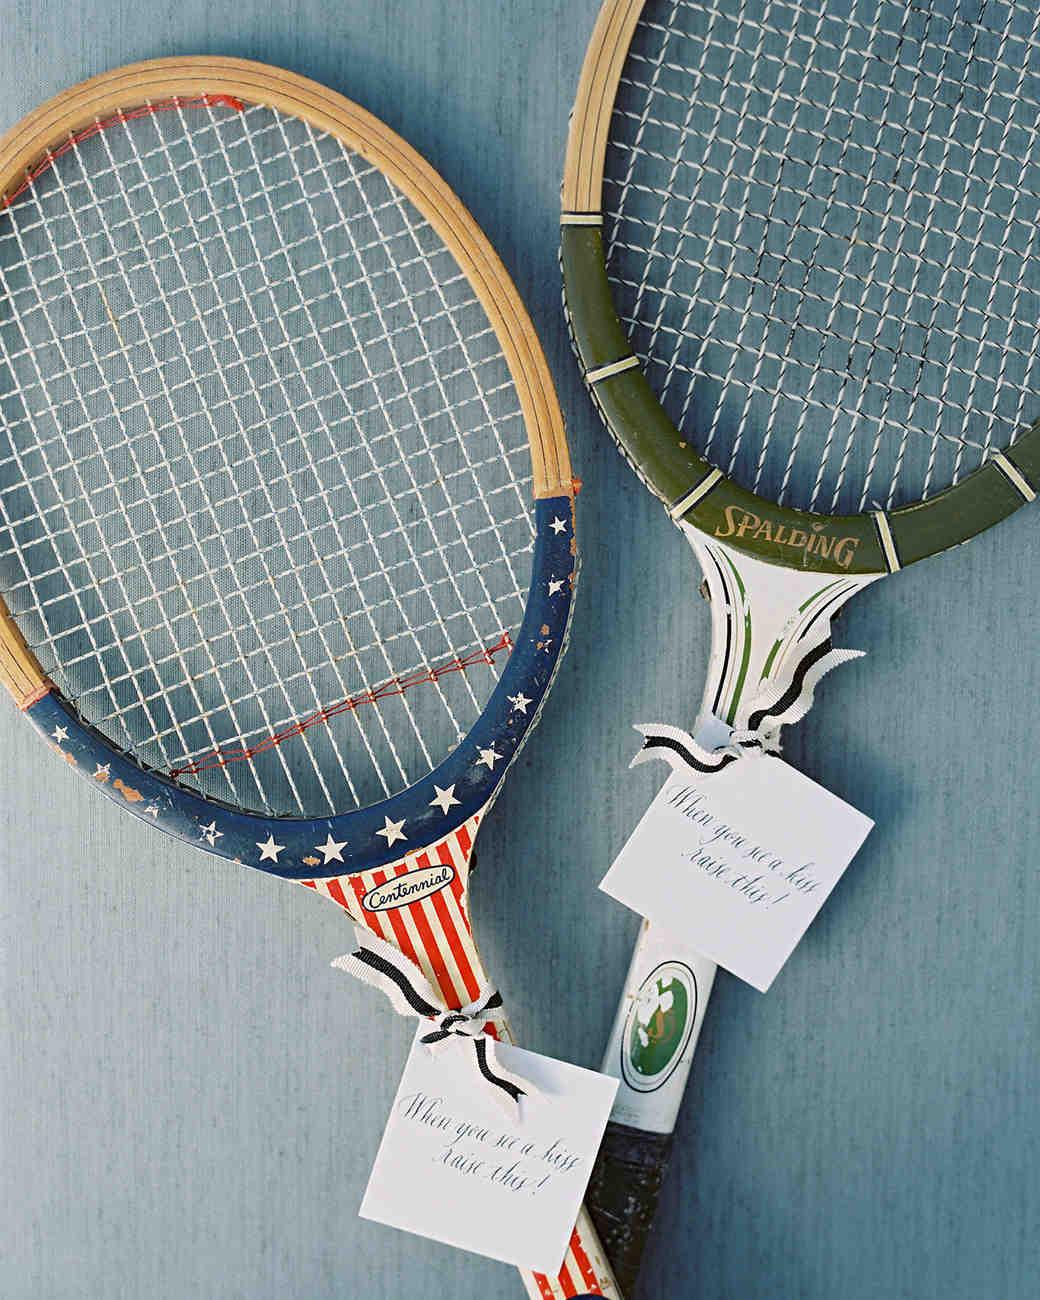 stephanie matt tennis racquets